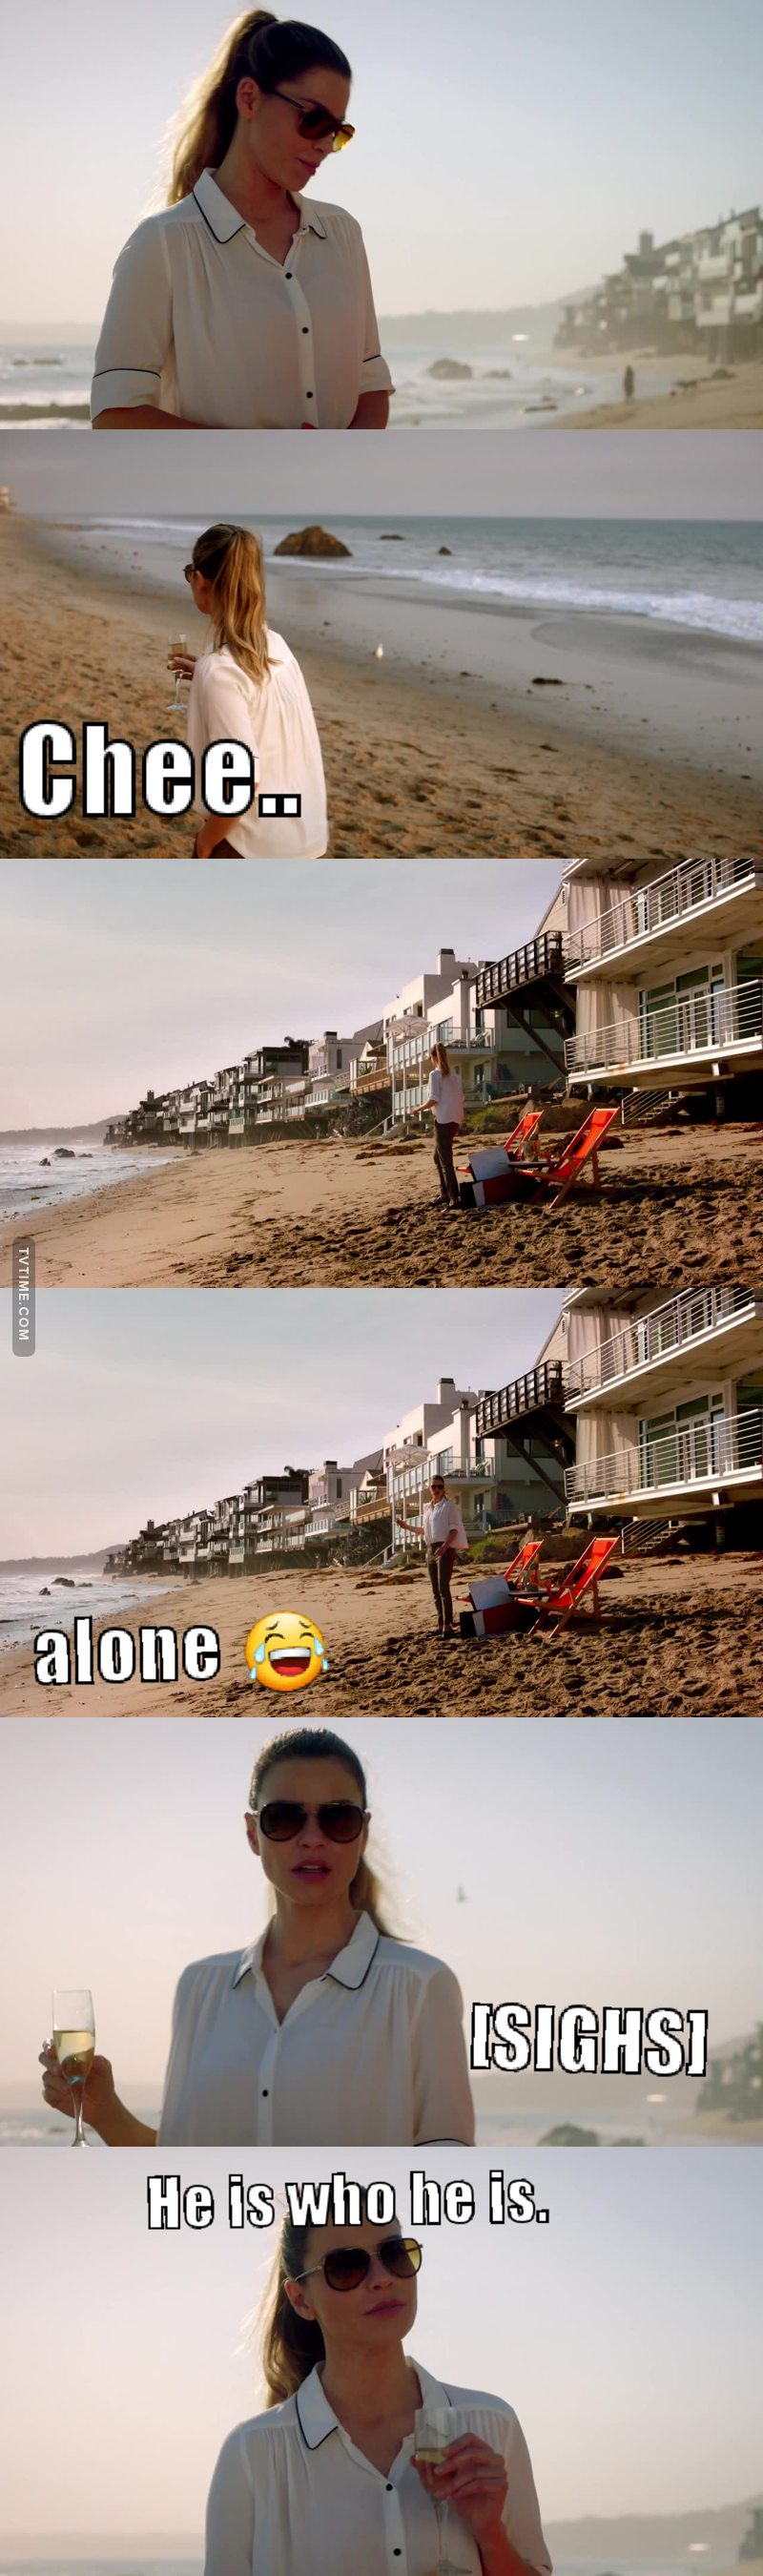 Alone detective decker 😂😂